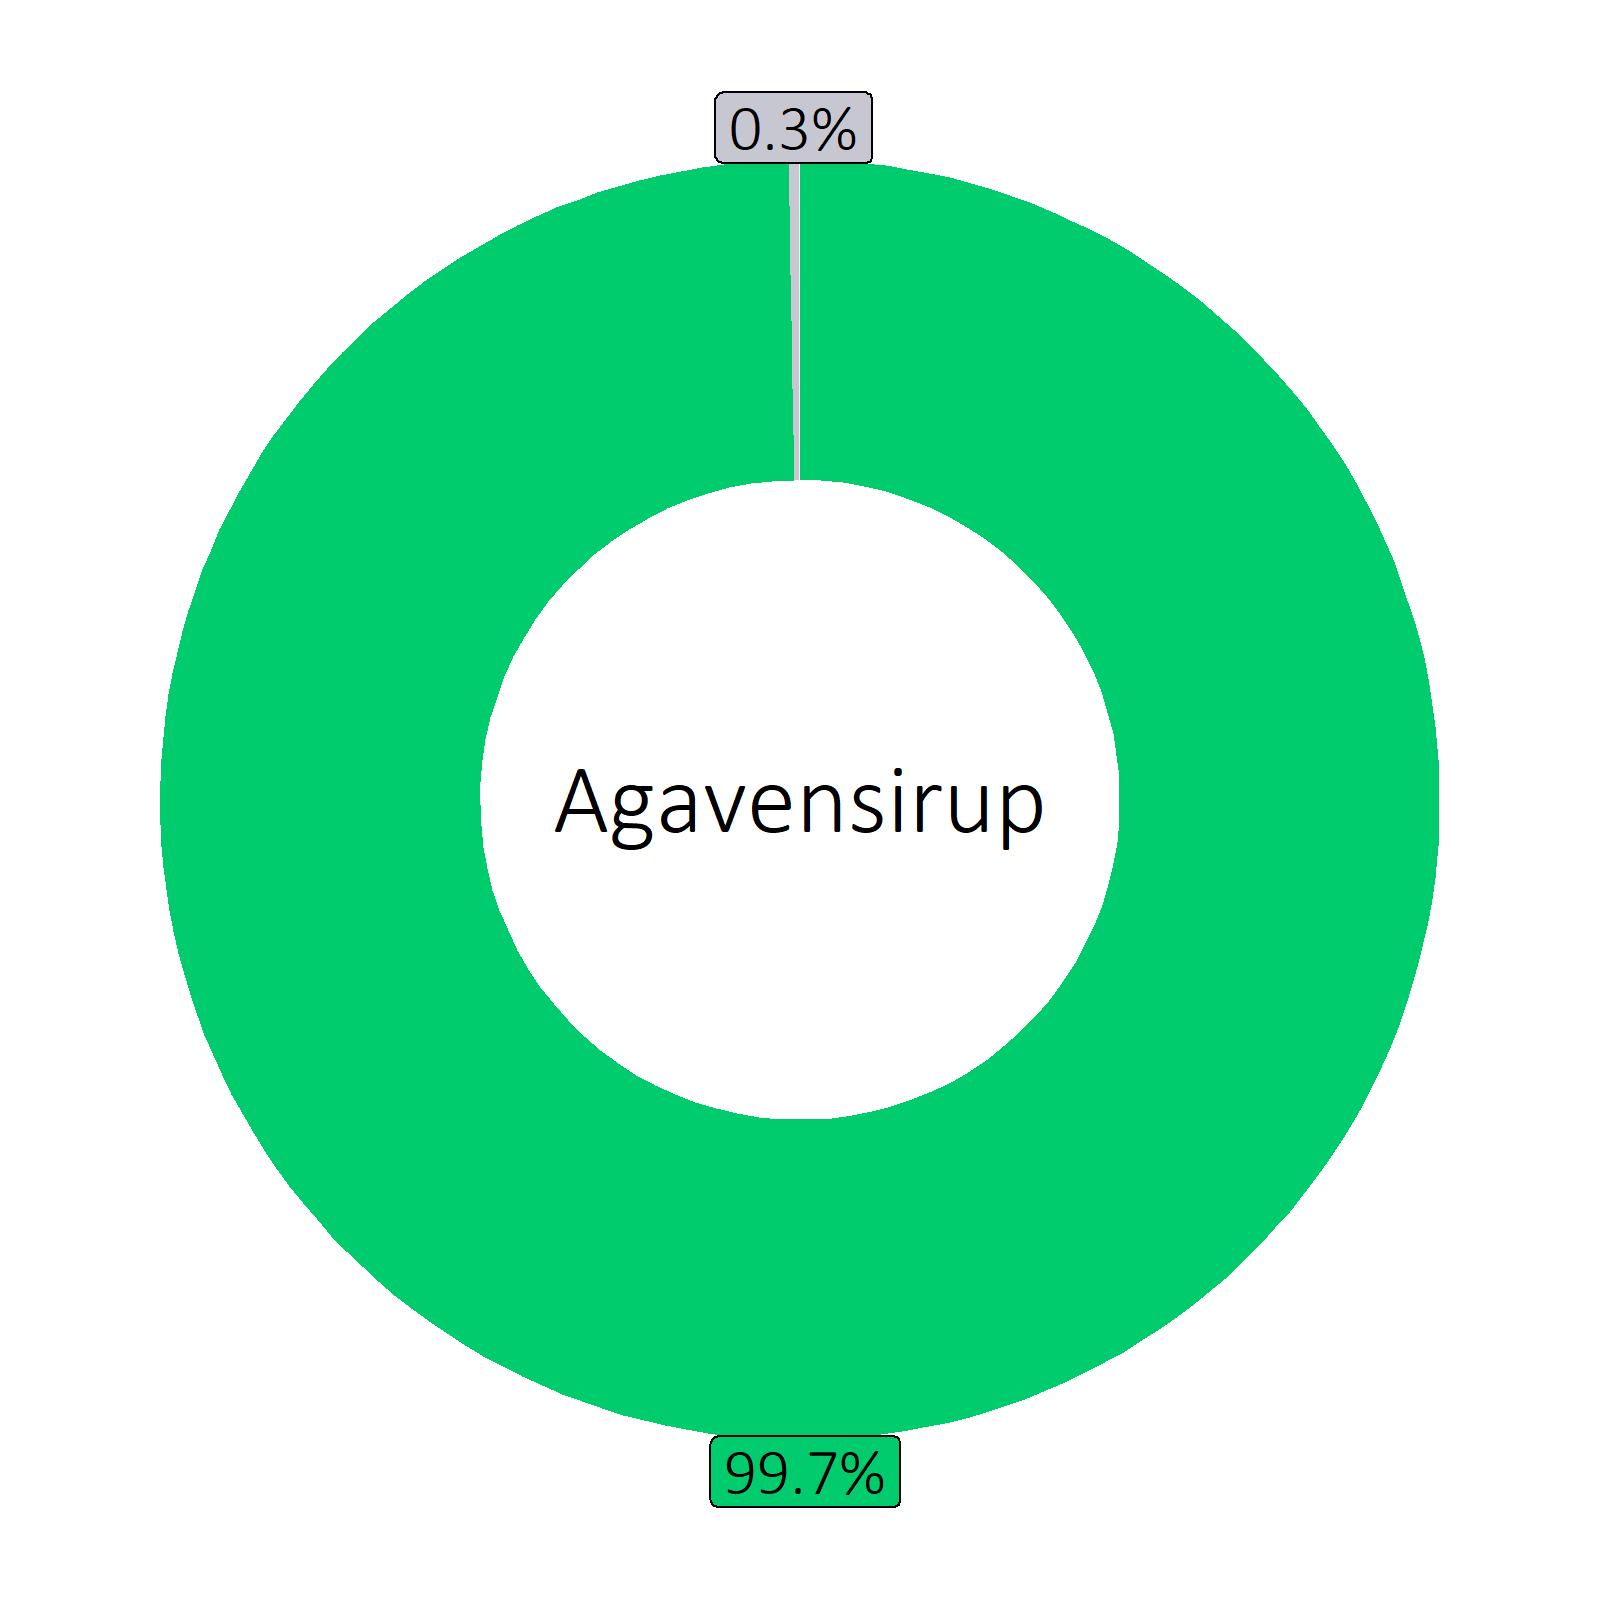 Bestandteile Agavensirup